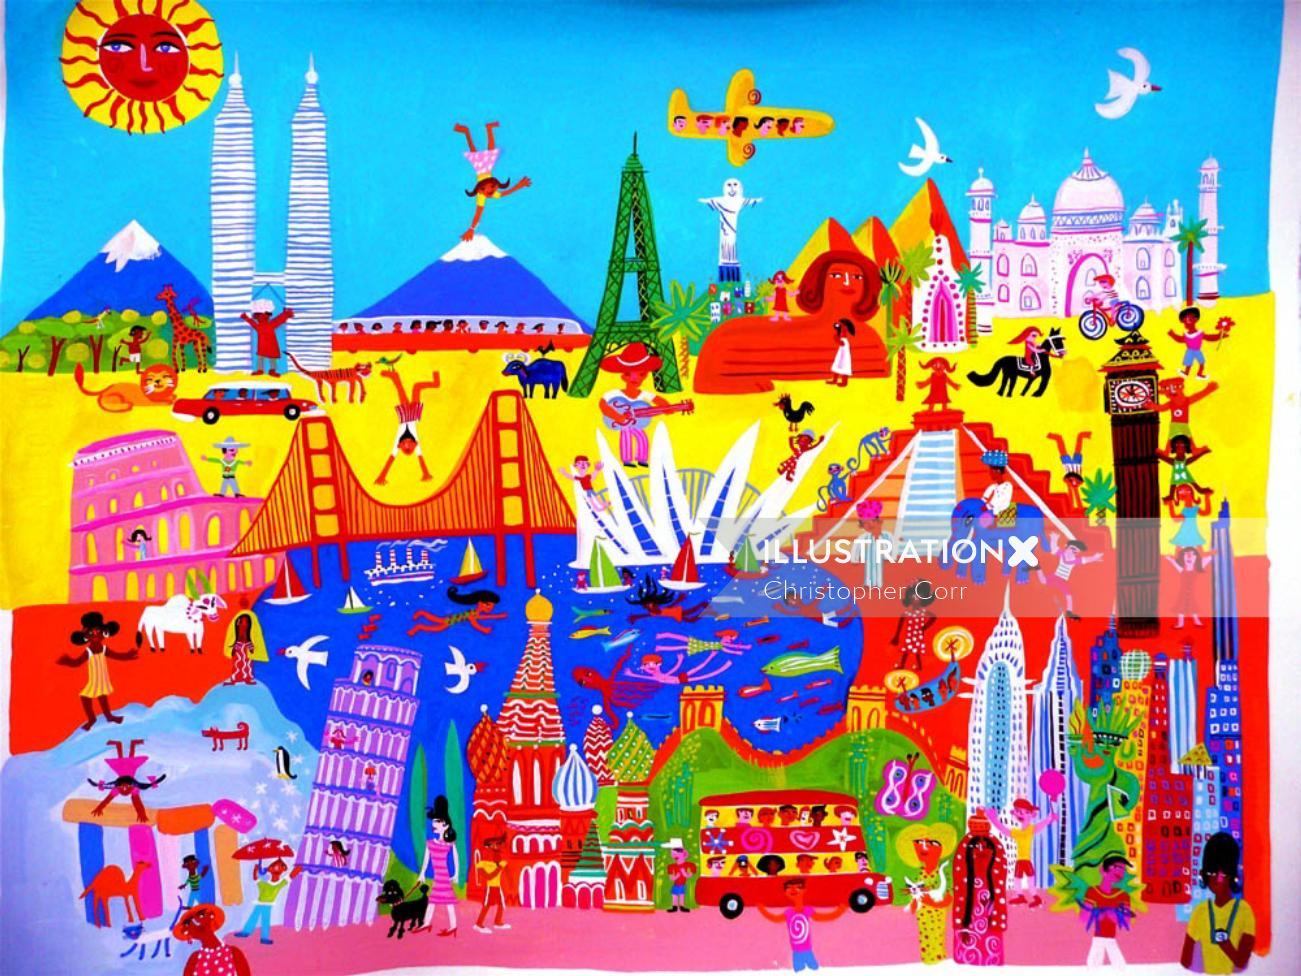 World Party celebration for children book